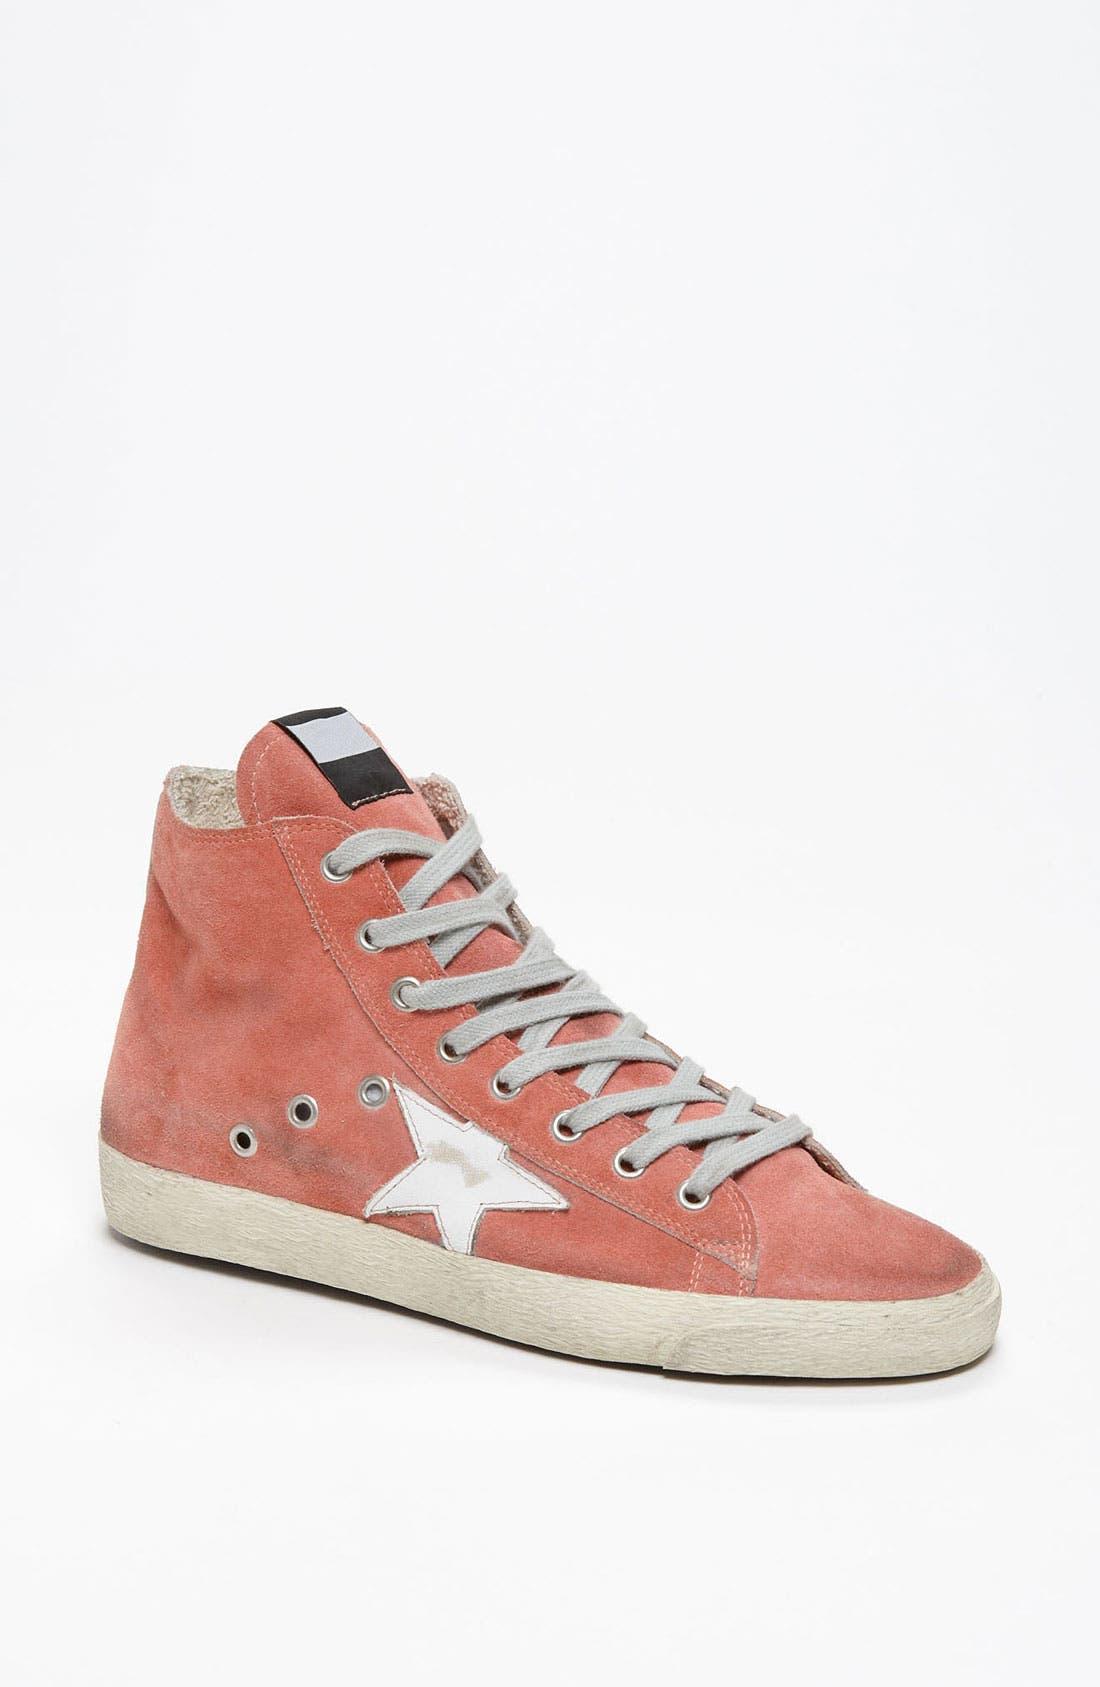 Main Image - Golden Goose 'Francy' Sneaker